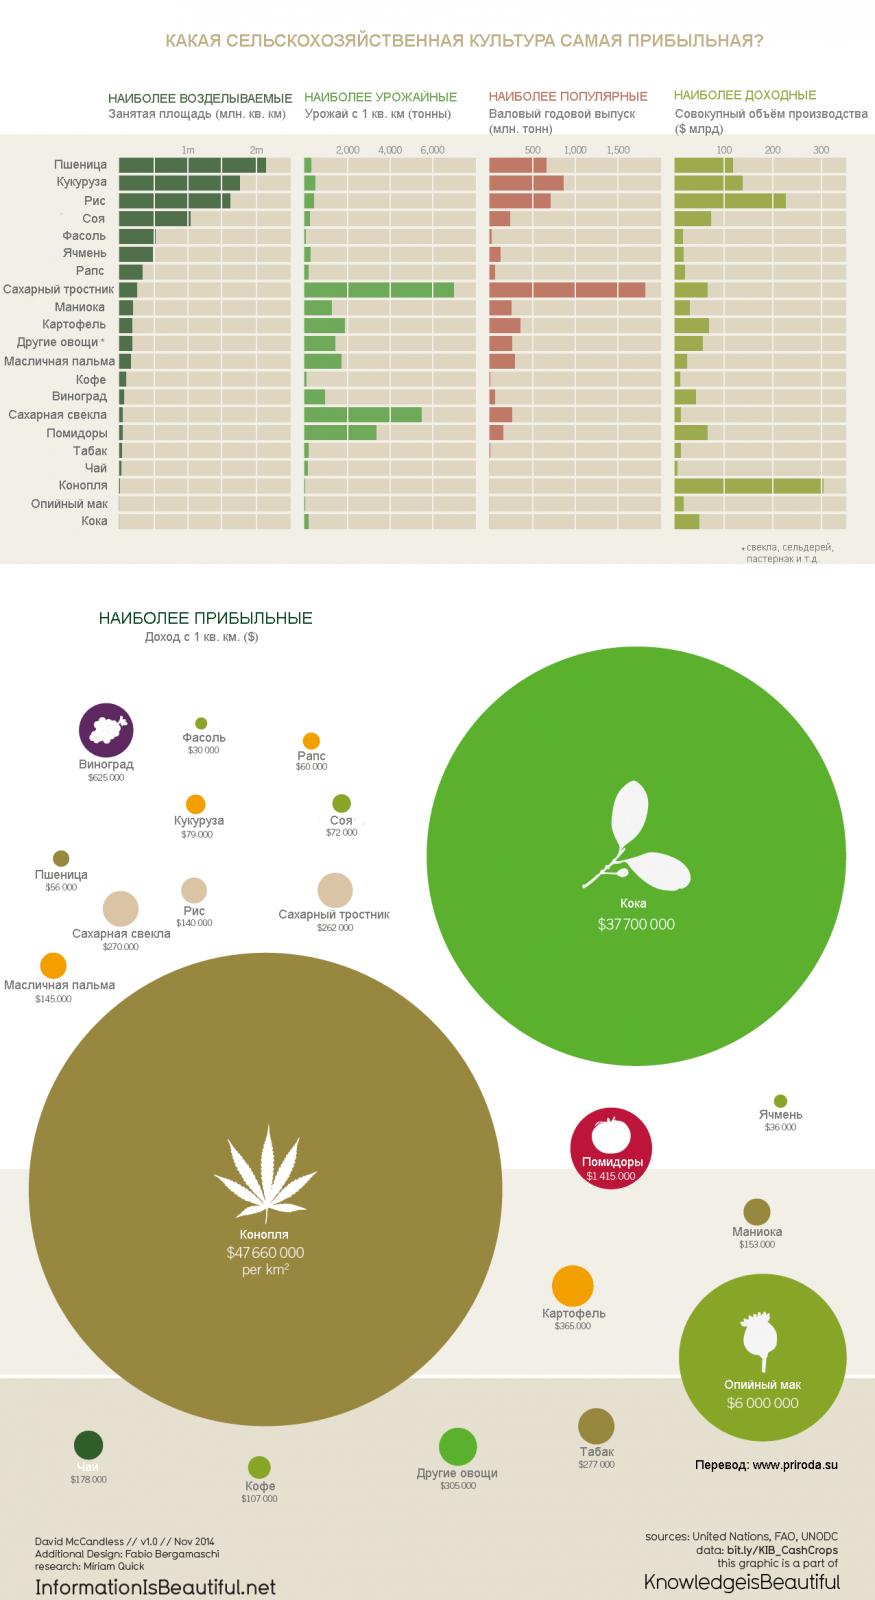 Какая сельскохозяйственная культура самая прибыльная